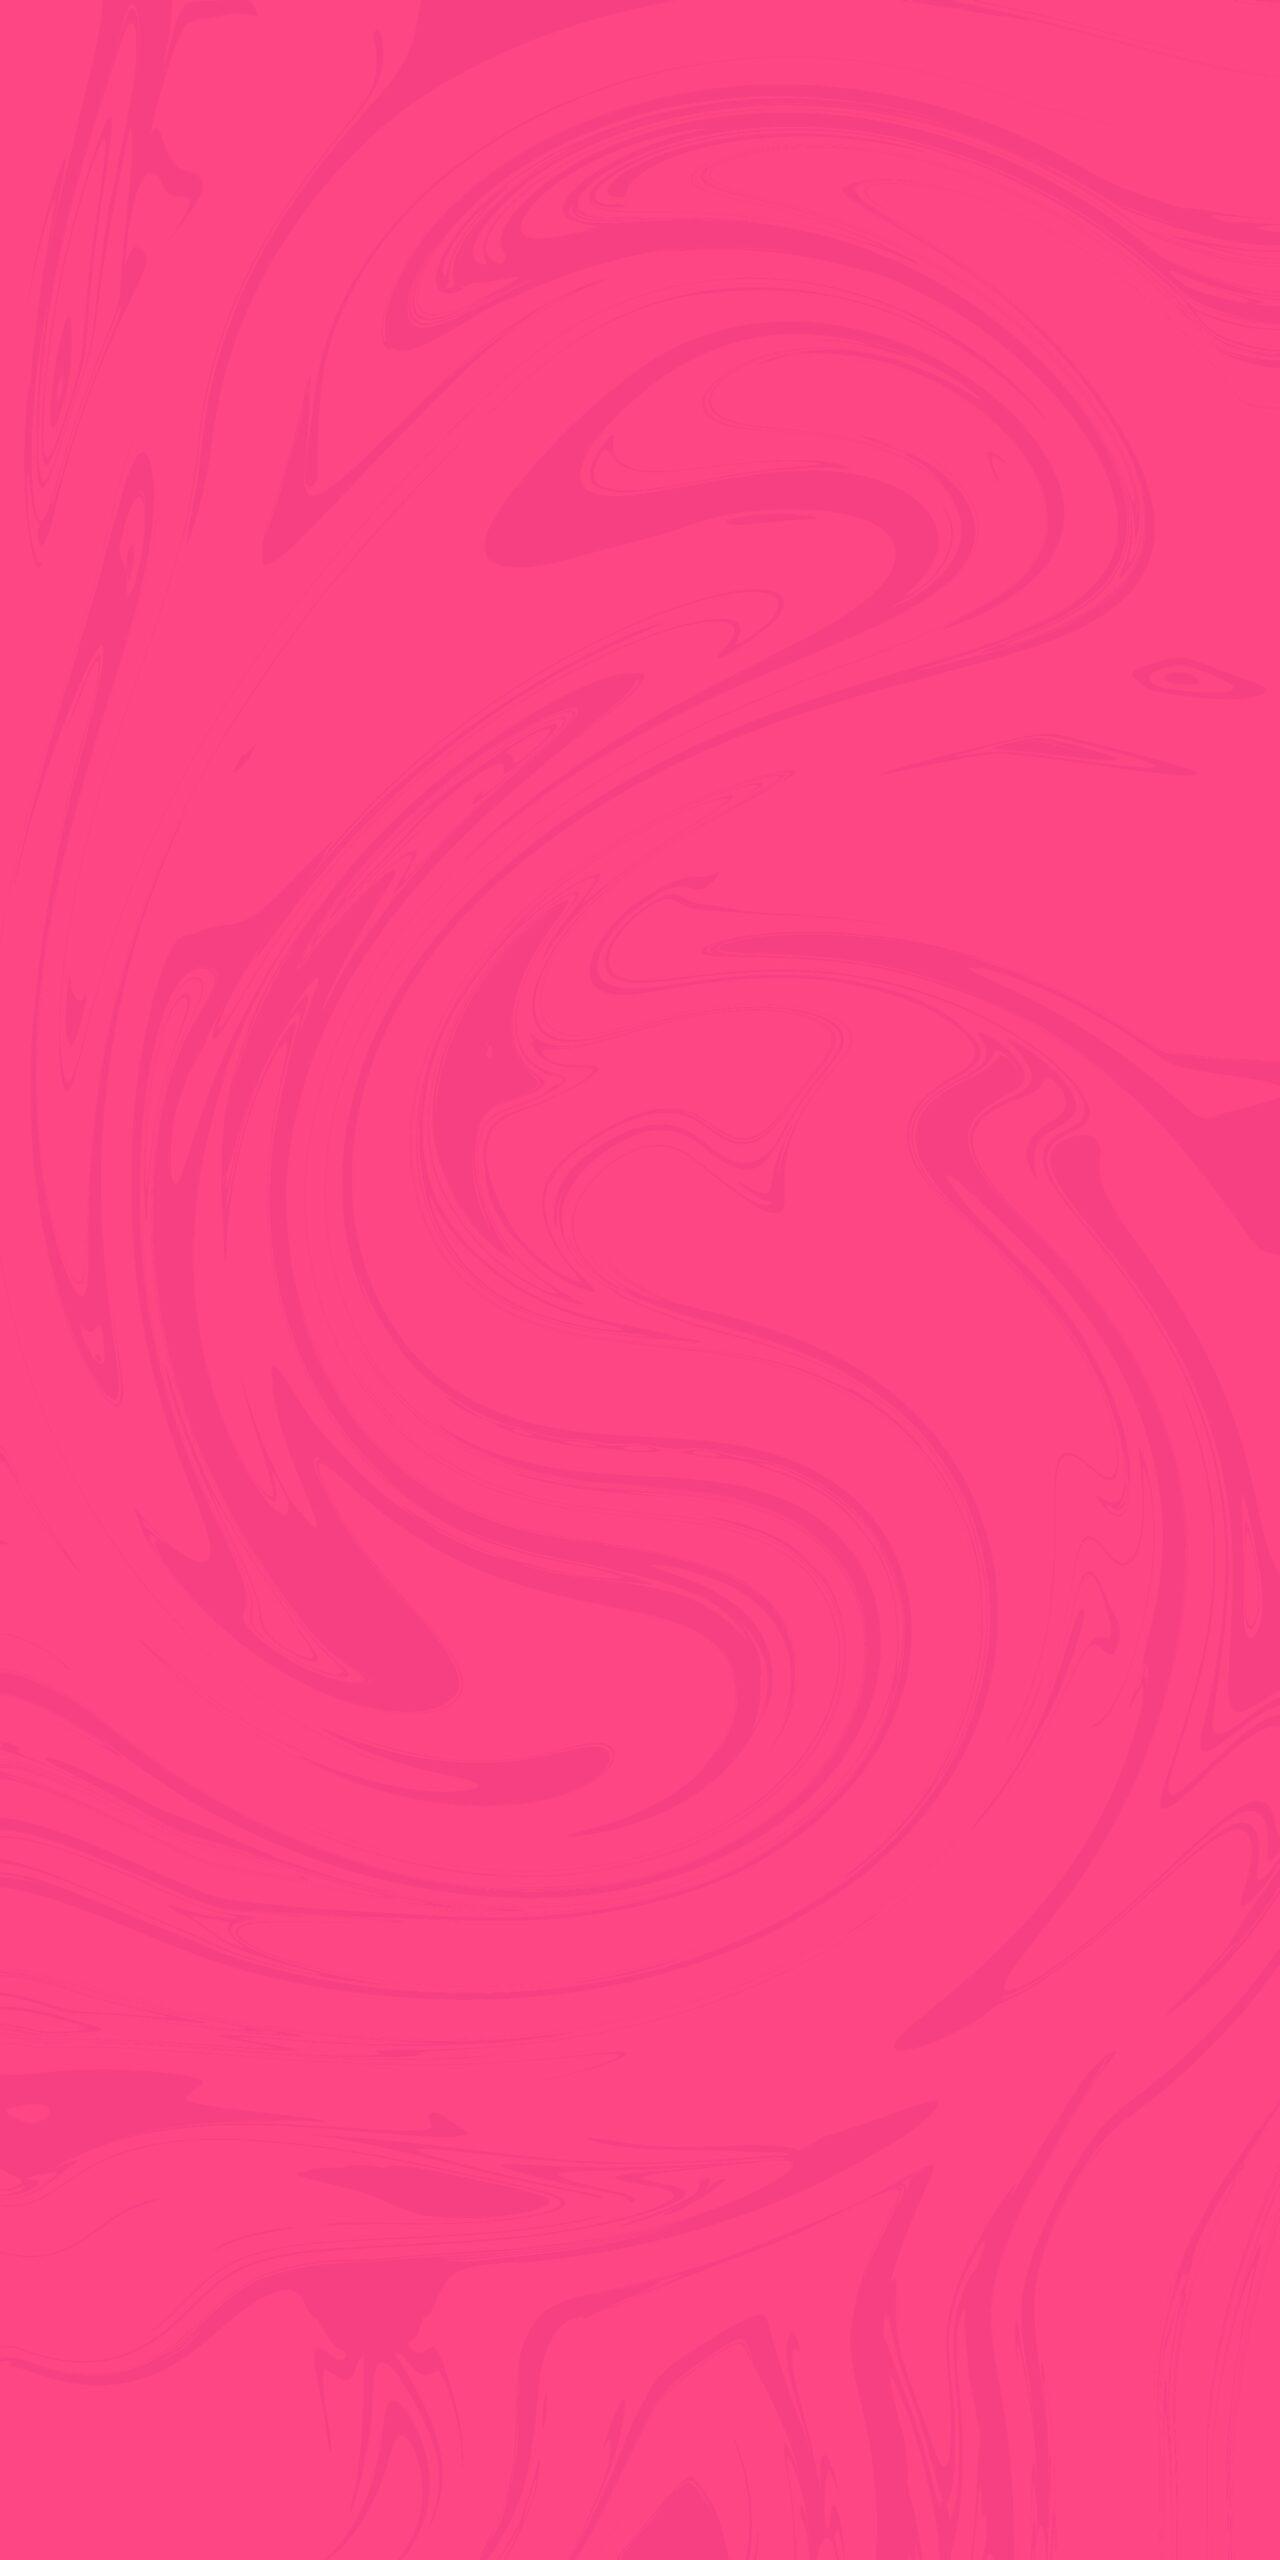 homer simpson sleeping pink background wallpaper